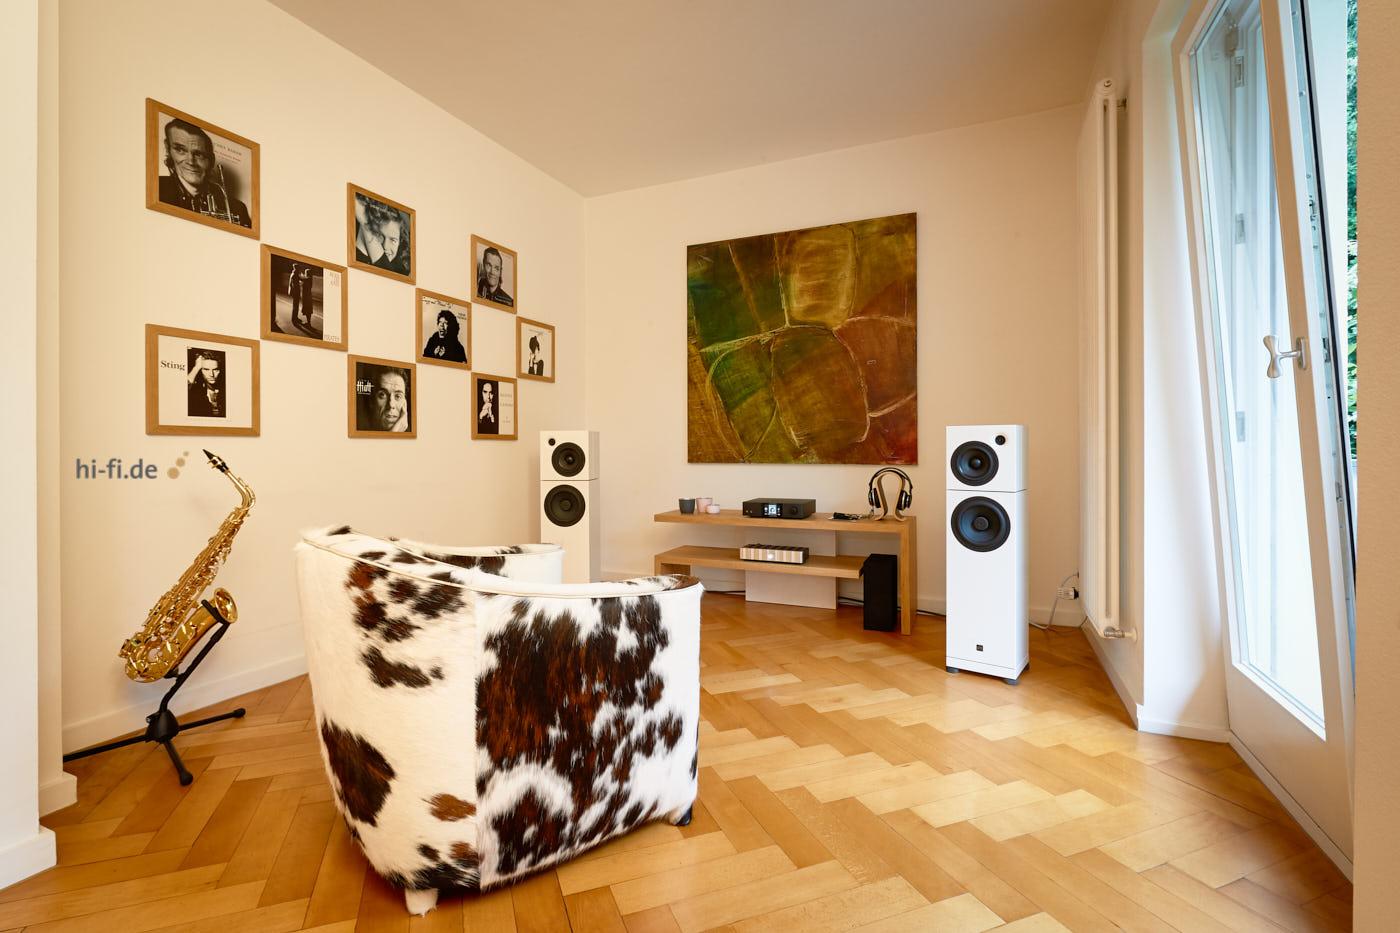 Sehring Audio S 803 Studio - Jeff Rowland Model 125 - Auralic Vega G2